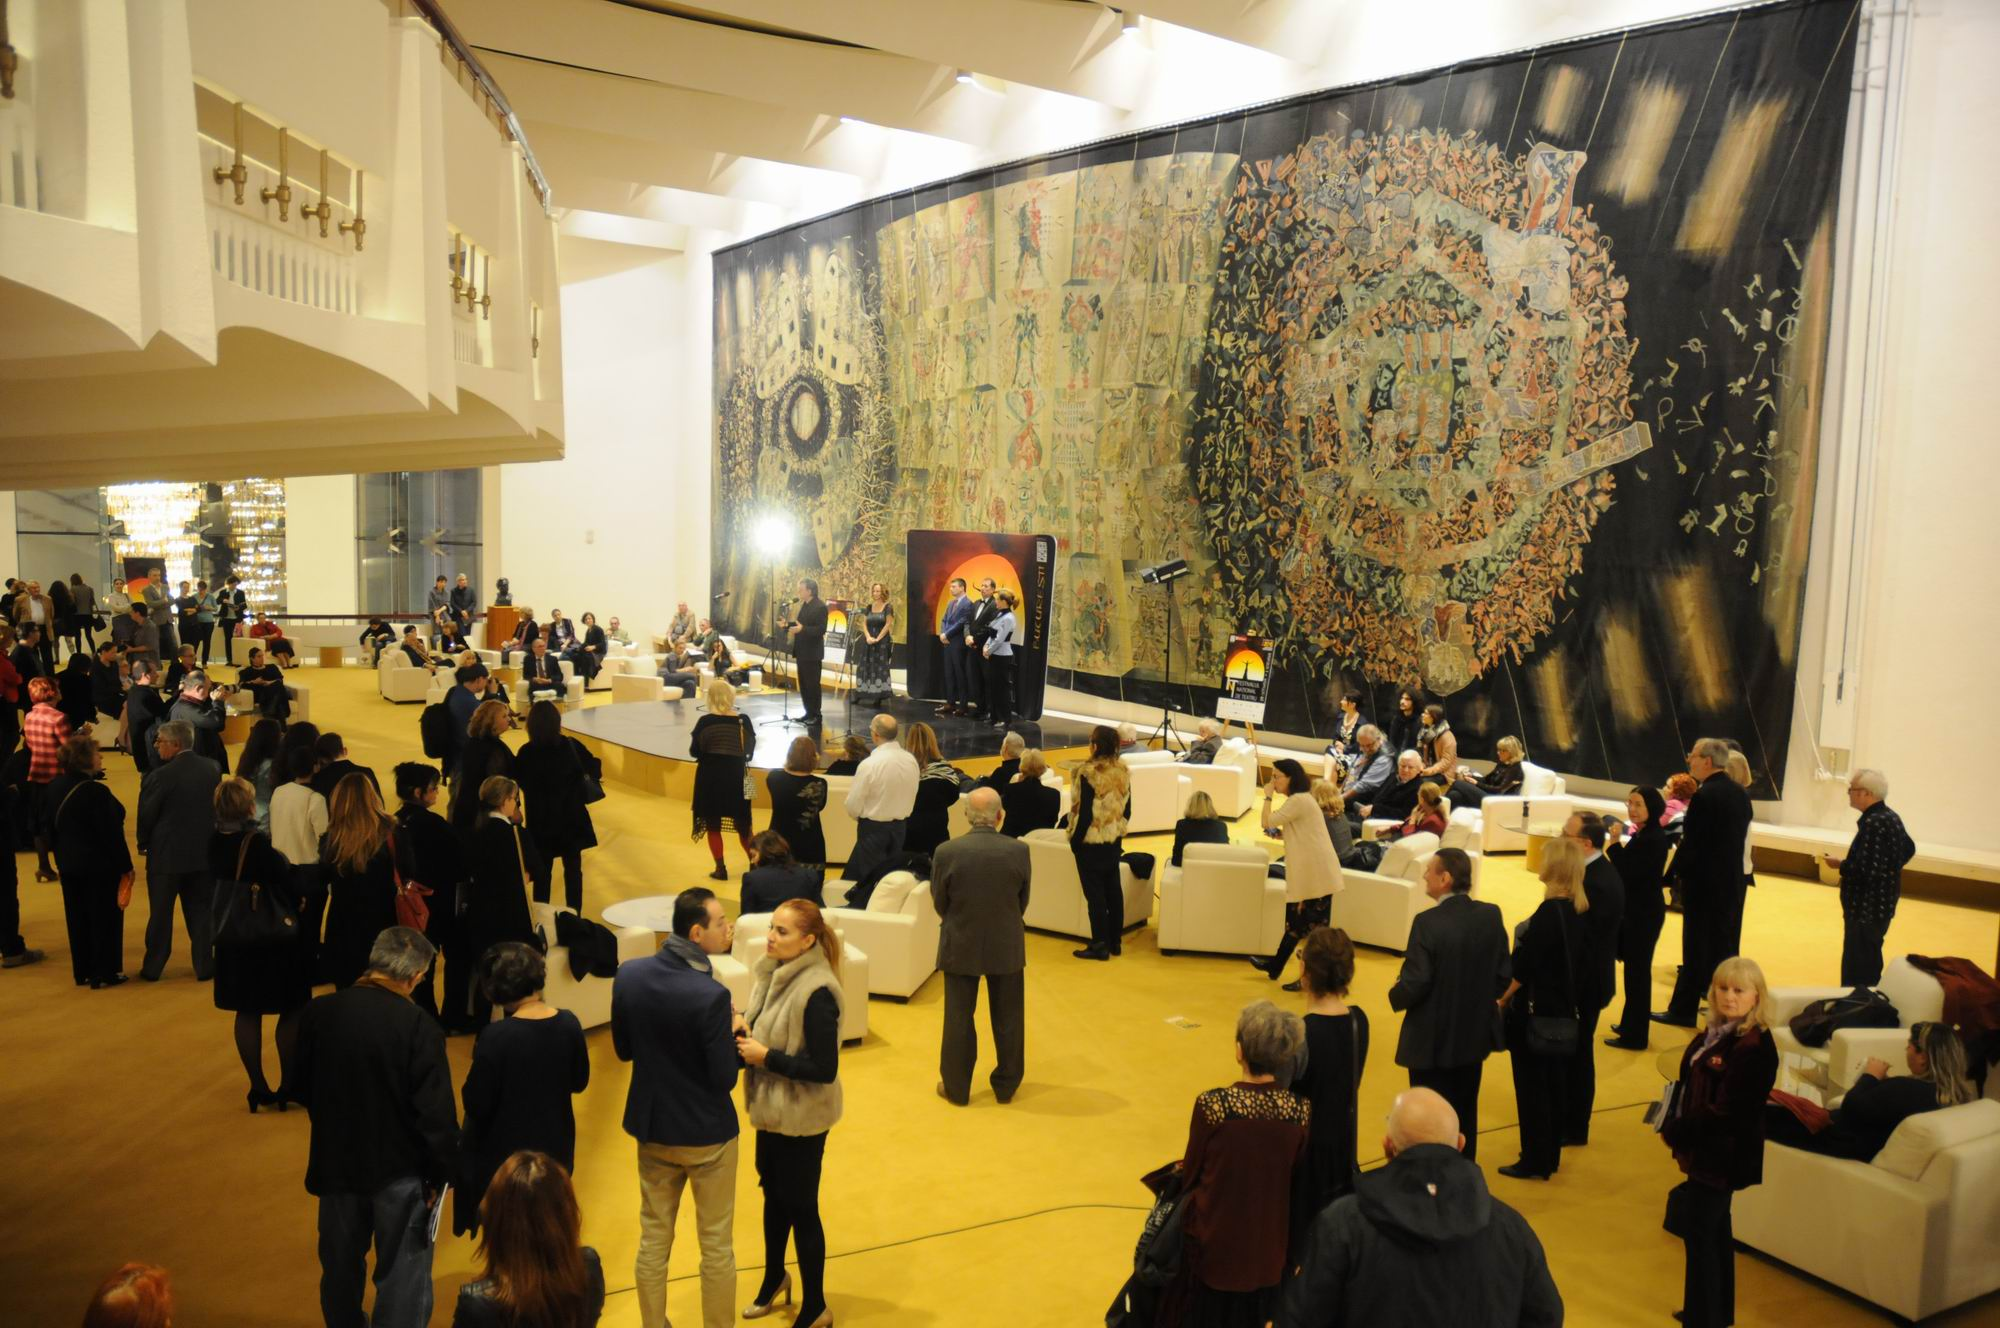 FNT 2015 - deschiderea oficiala TNB foto Lucian Muntean _0011